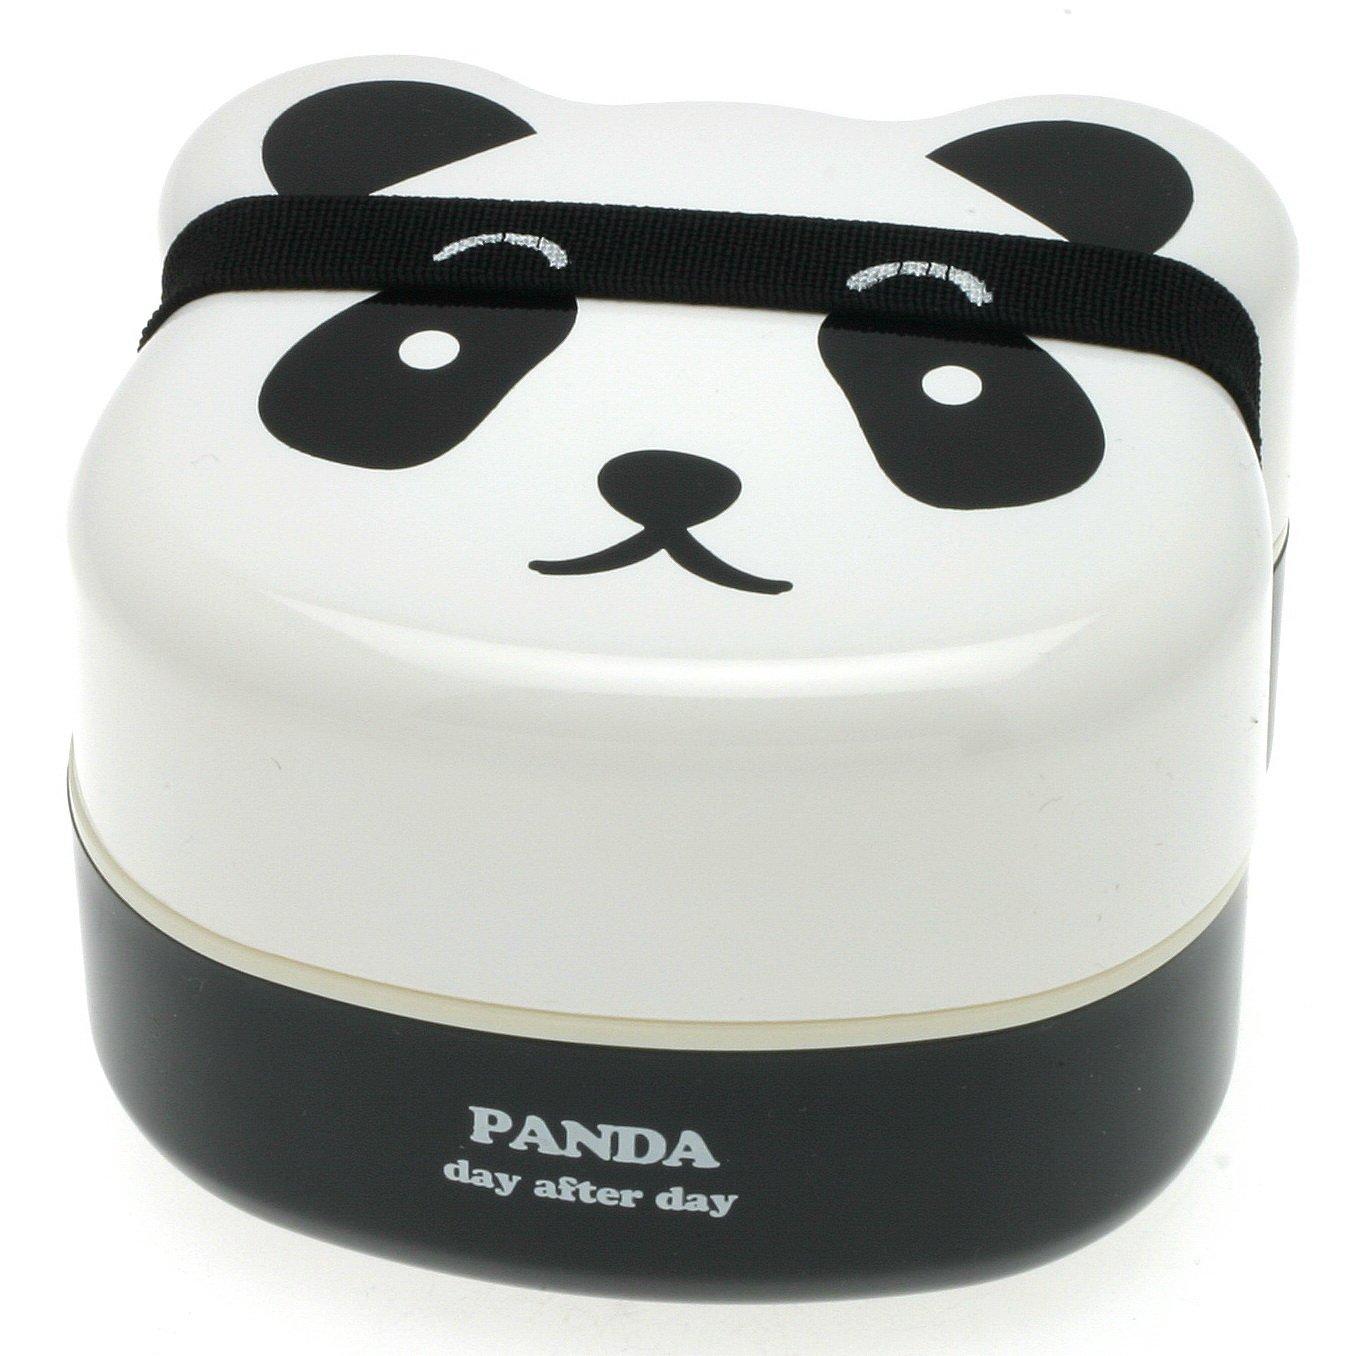 kotobuki 2 tier bento box panda cute divider compartment lunch container stack. Black Bedroom Furniture Sets. Home Design Ideas